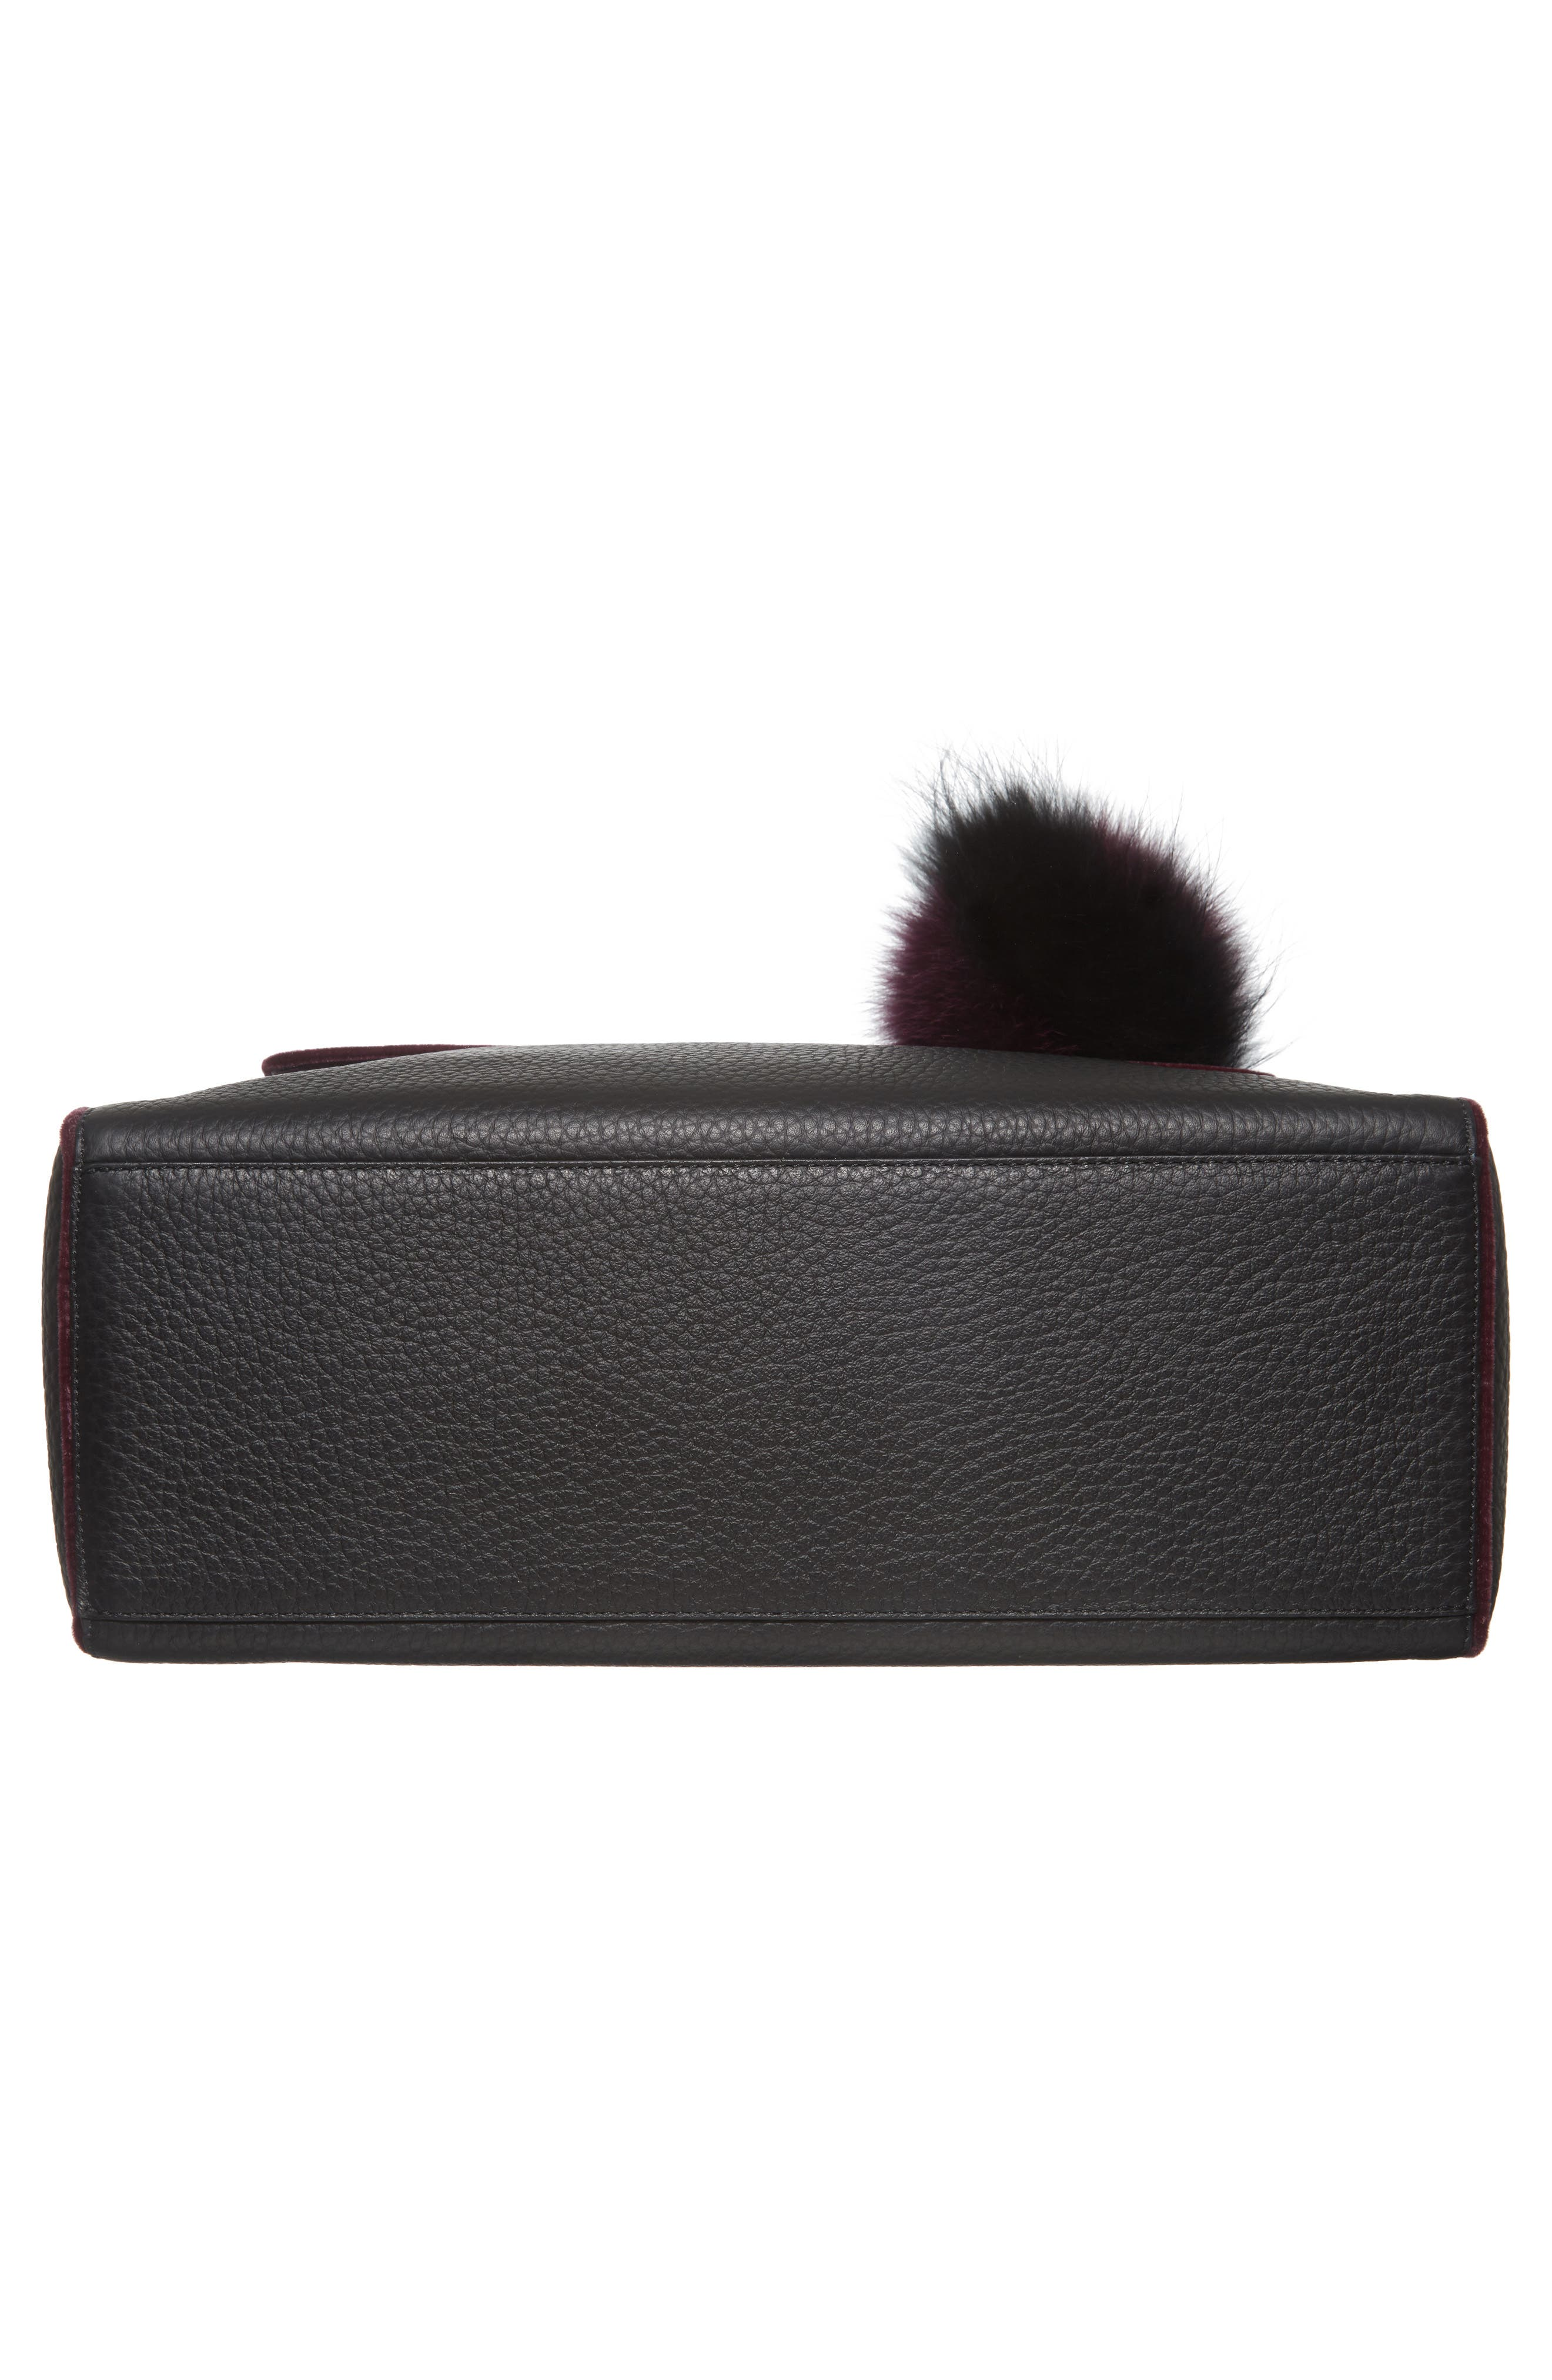 Alternate Image 5  - Orciani Large Sveva Soft Leather Top Handle Satchel with Genuine Fur Bag Charm